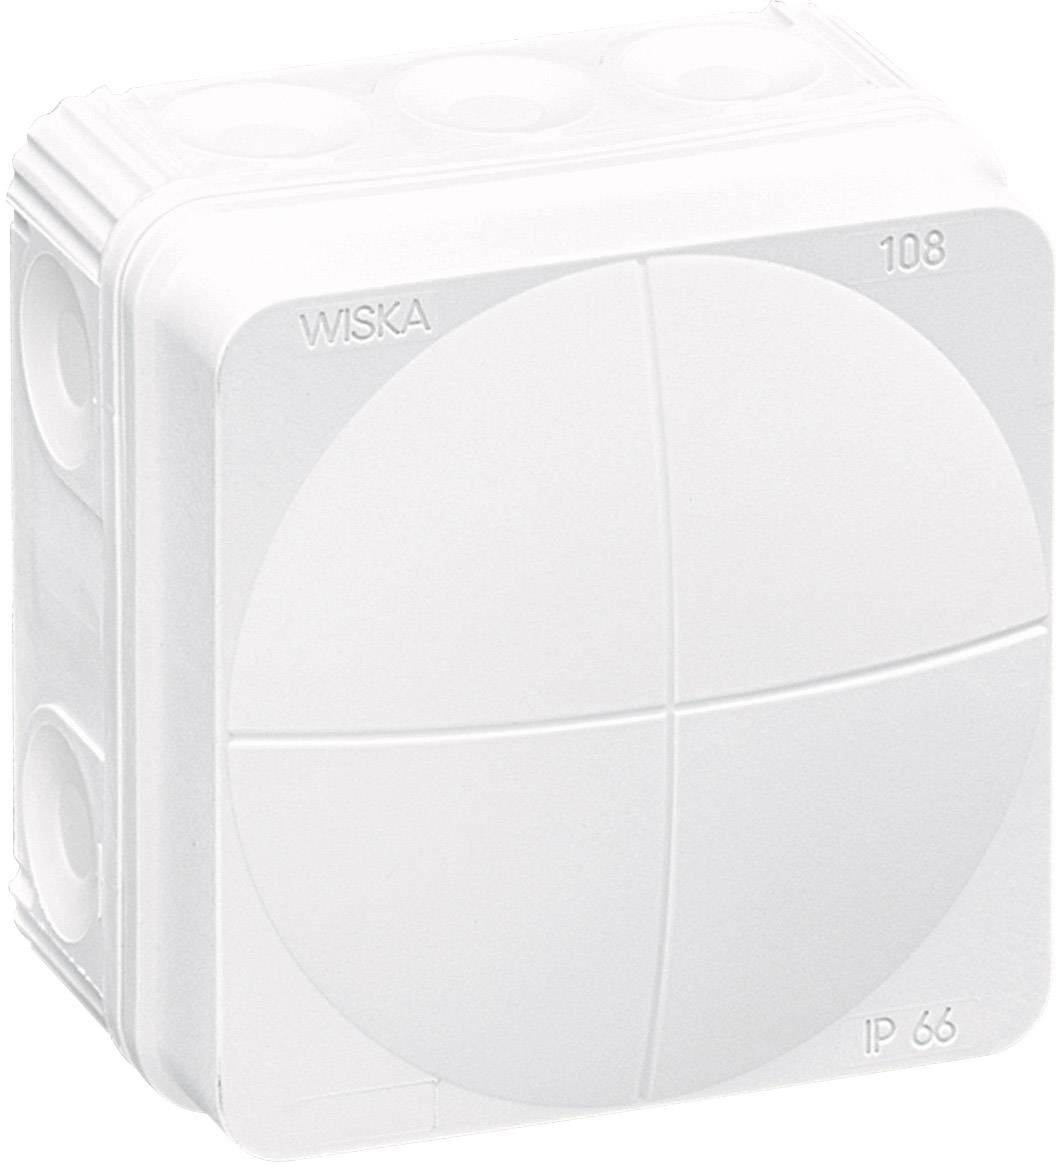 Rozbočovací krabice Wiska Combi 108, IP66, bílá, 10060622